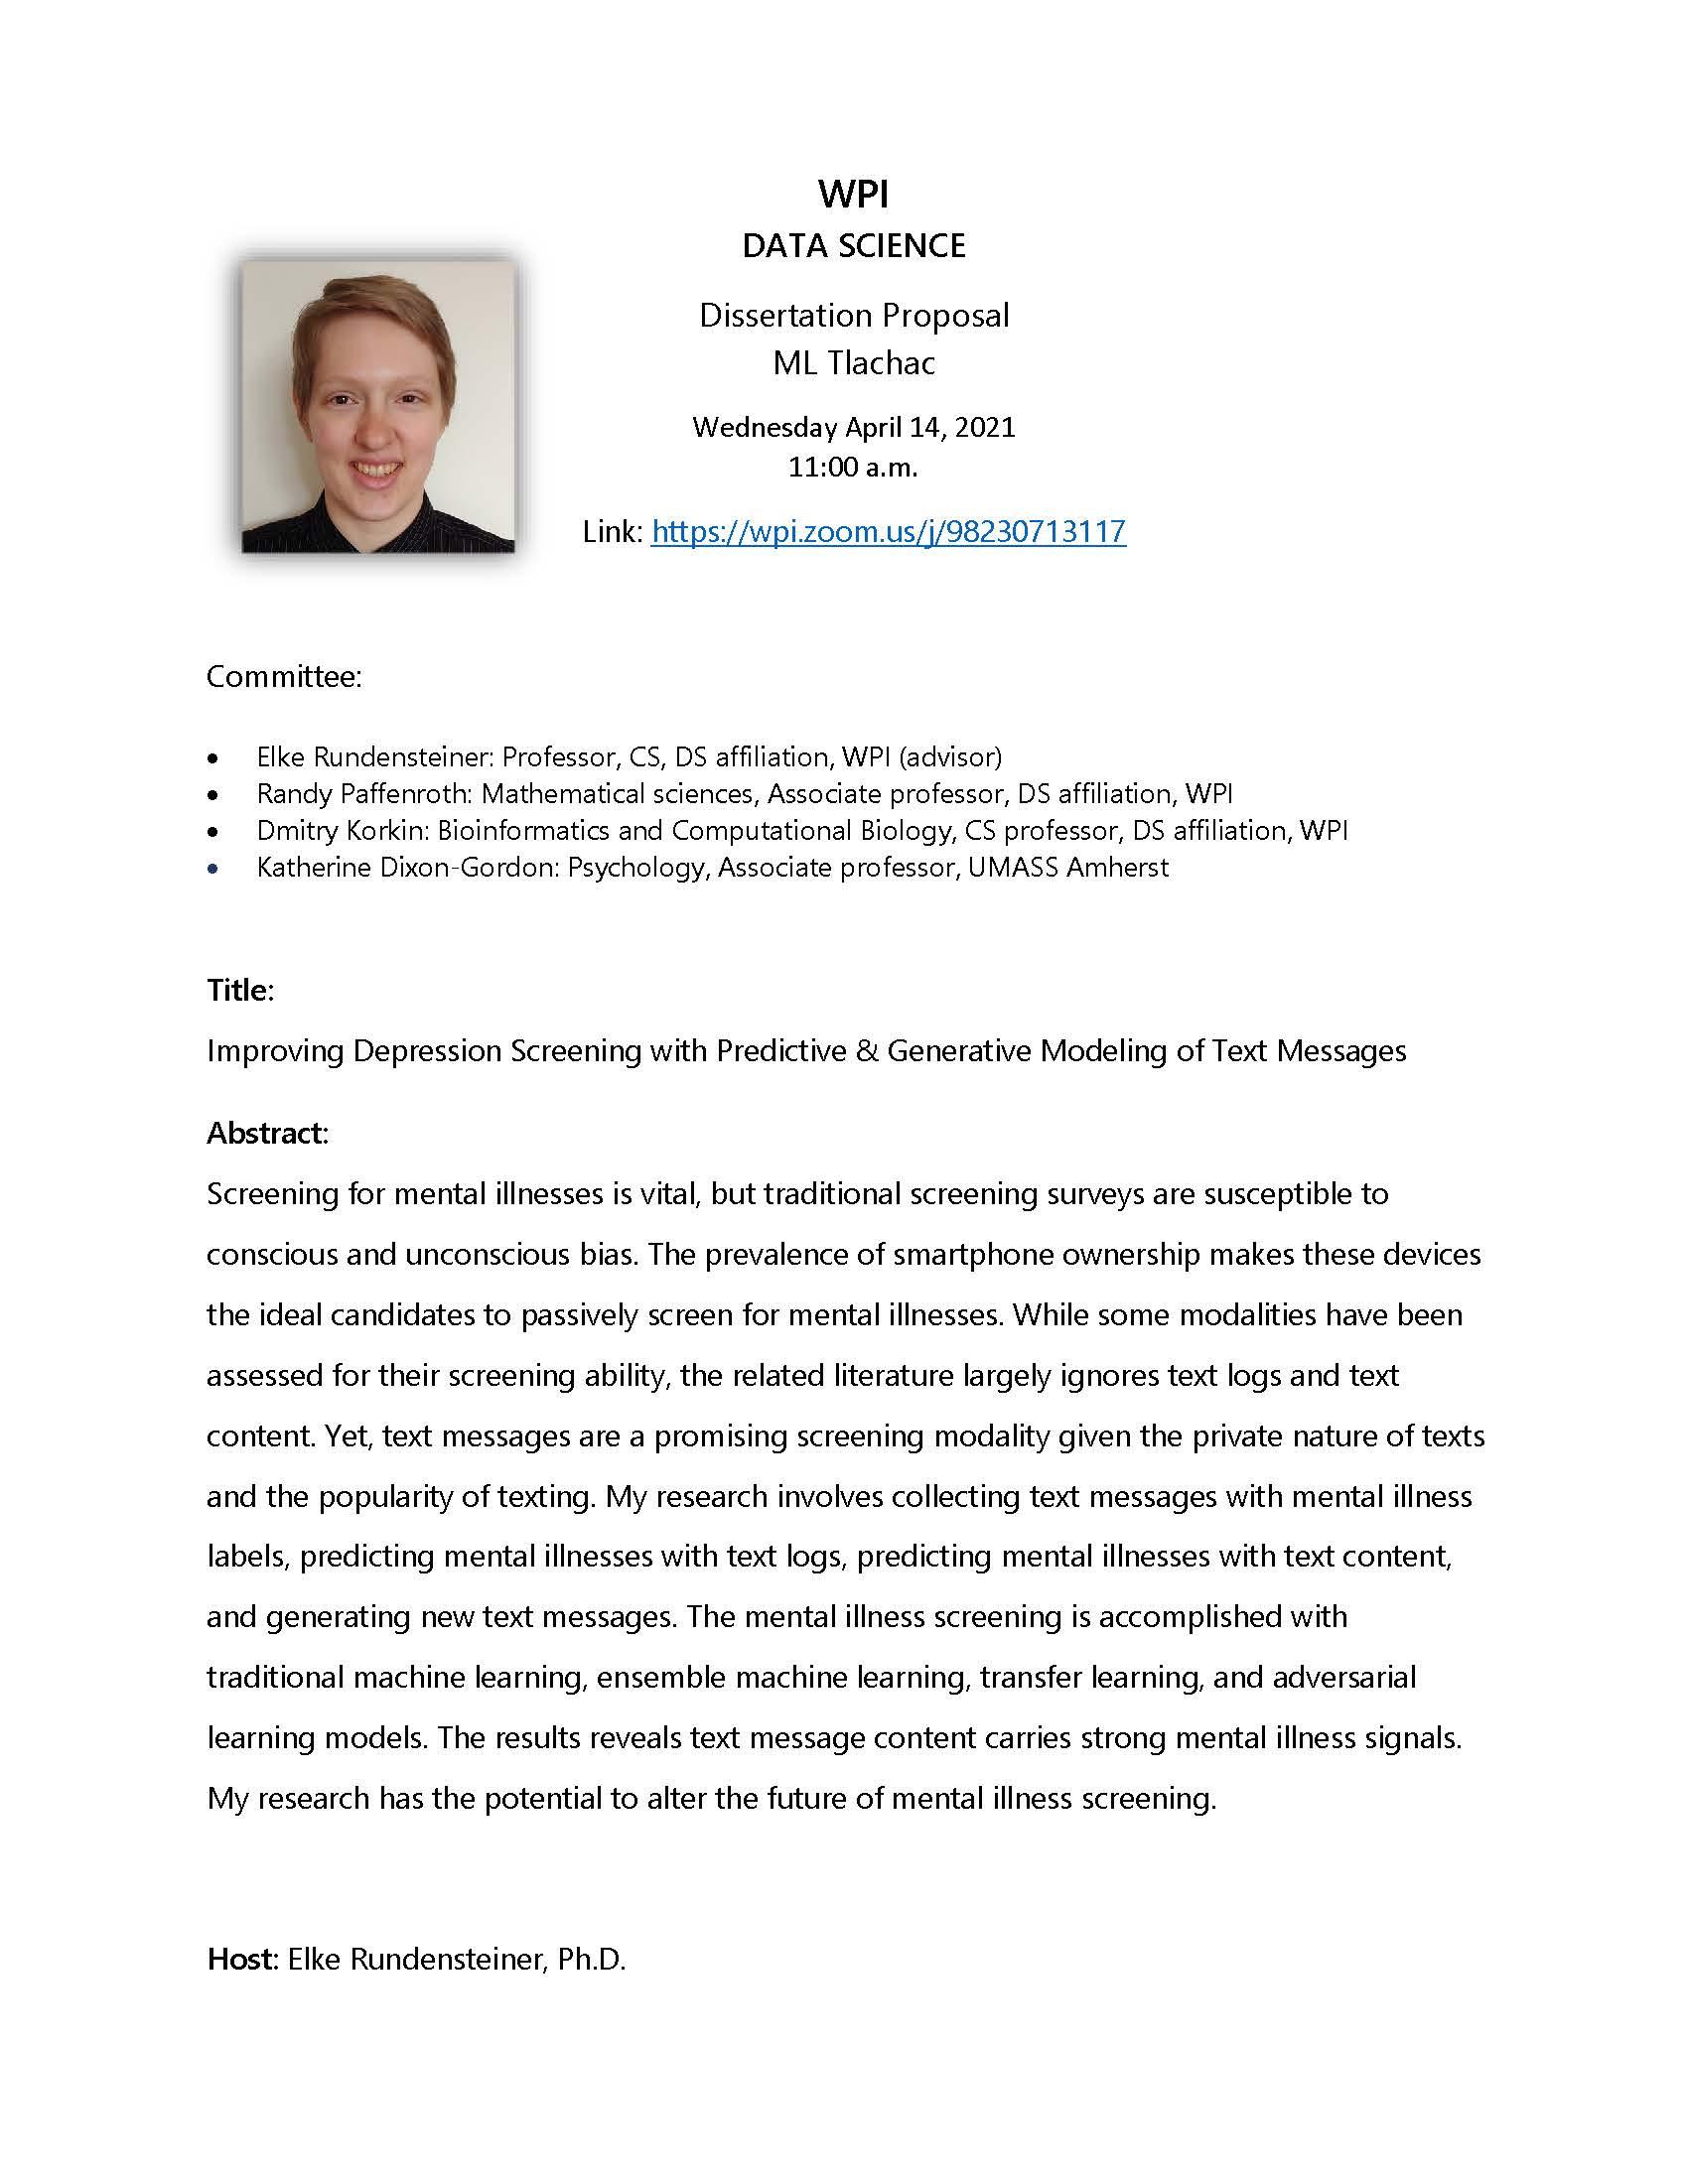 Dissertation Proposal ML Tlachac alt